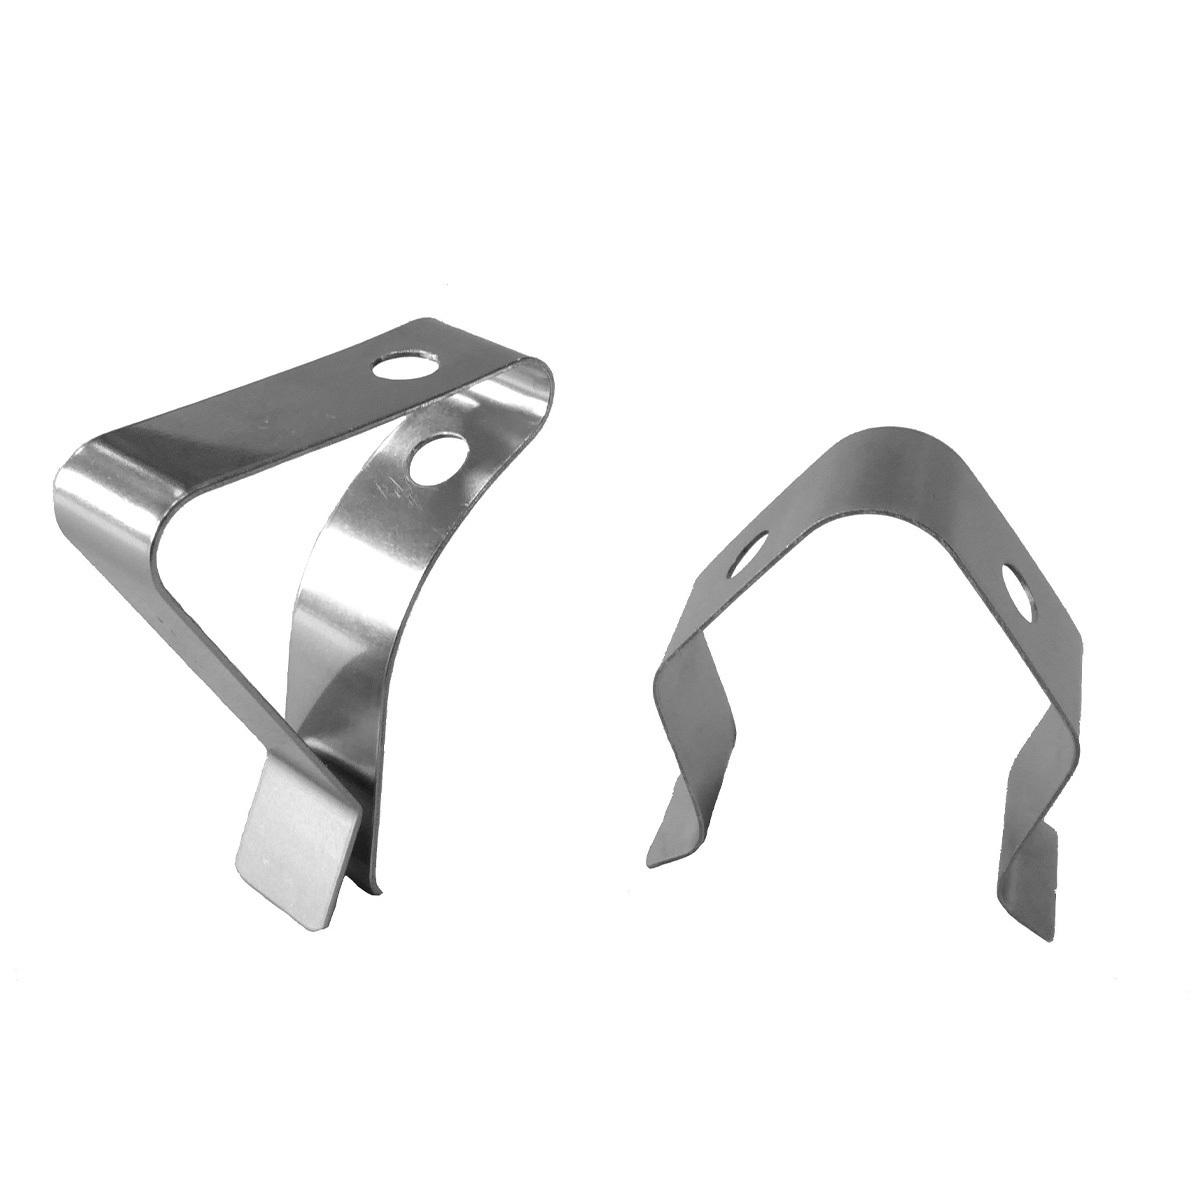 30-3525-60-clips-für-grill-bratenthermometer-1200x1200px.jpg